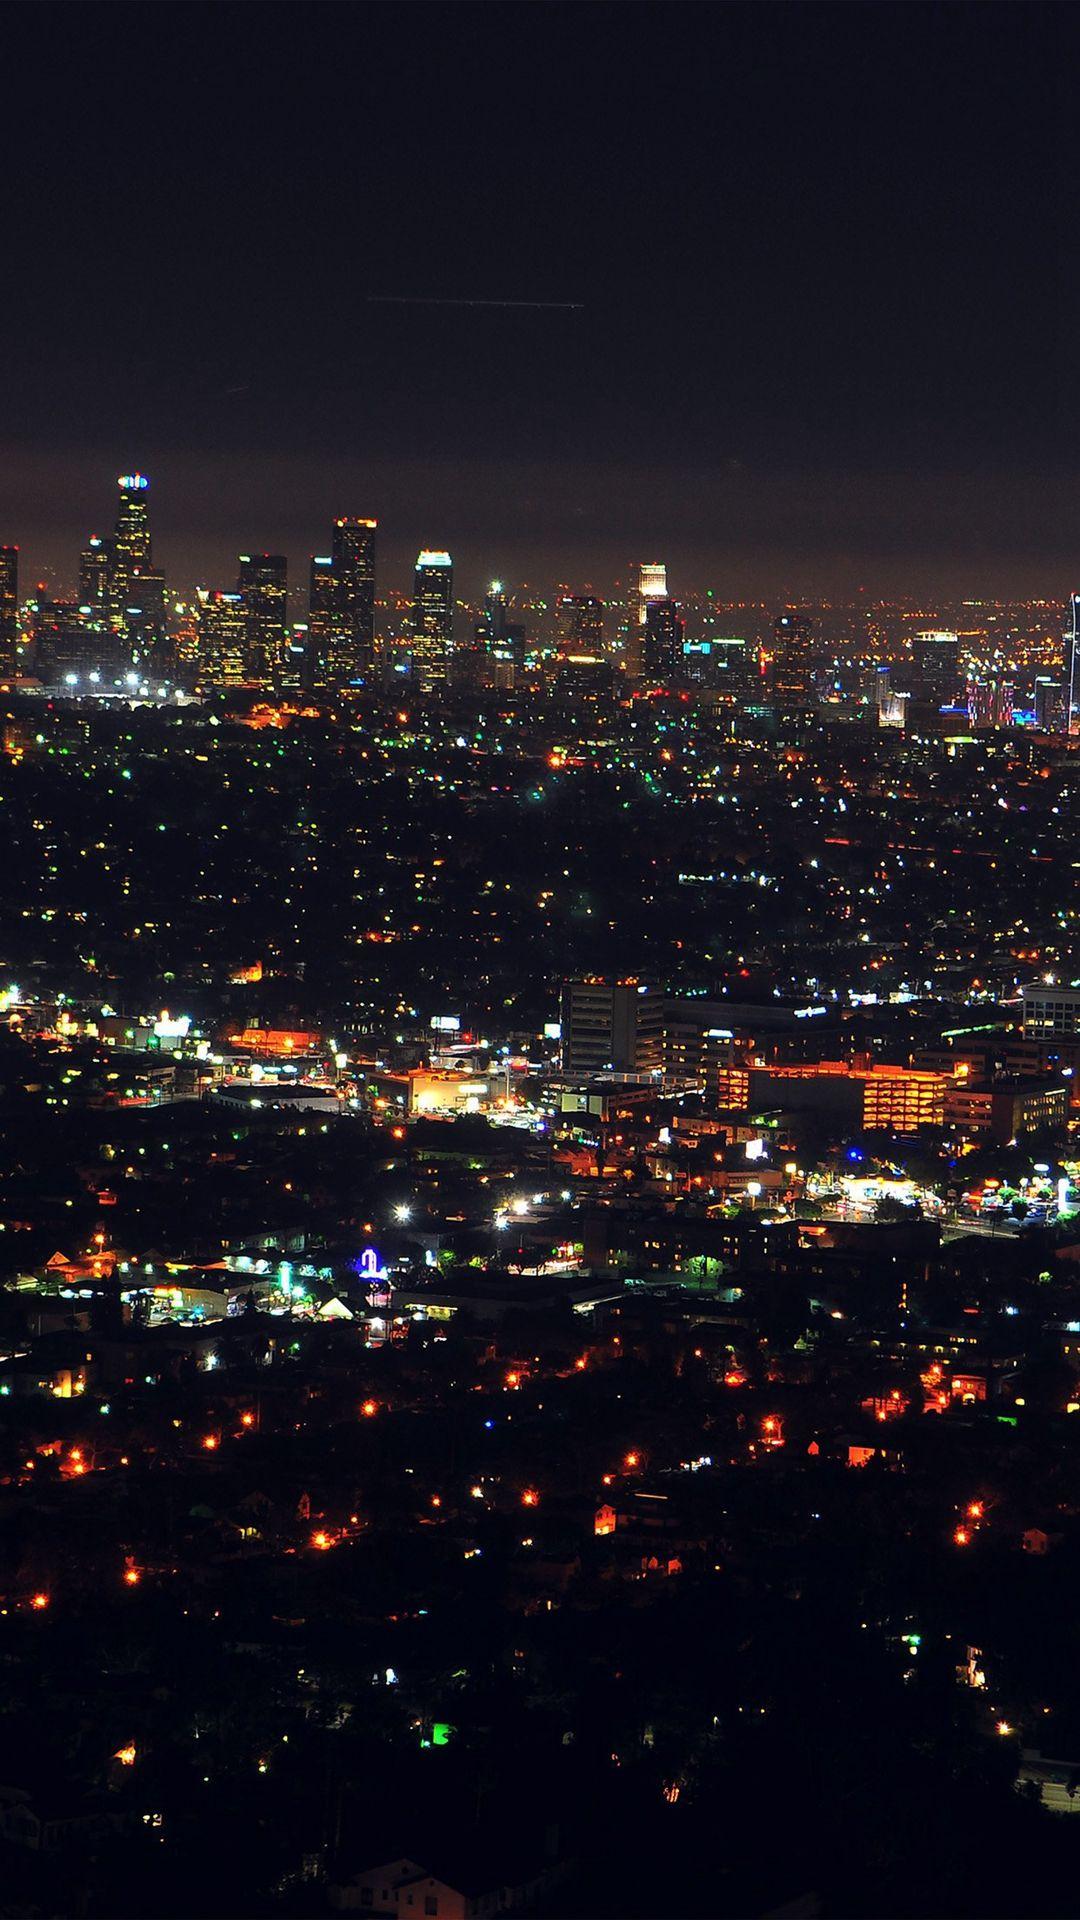 Wallpaper iphone city - City View Night Light Iphone 6 Plus Wallpaper